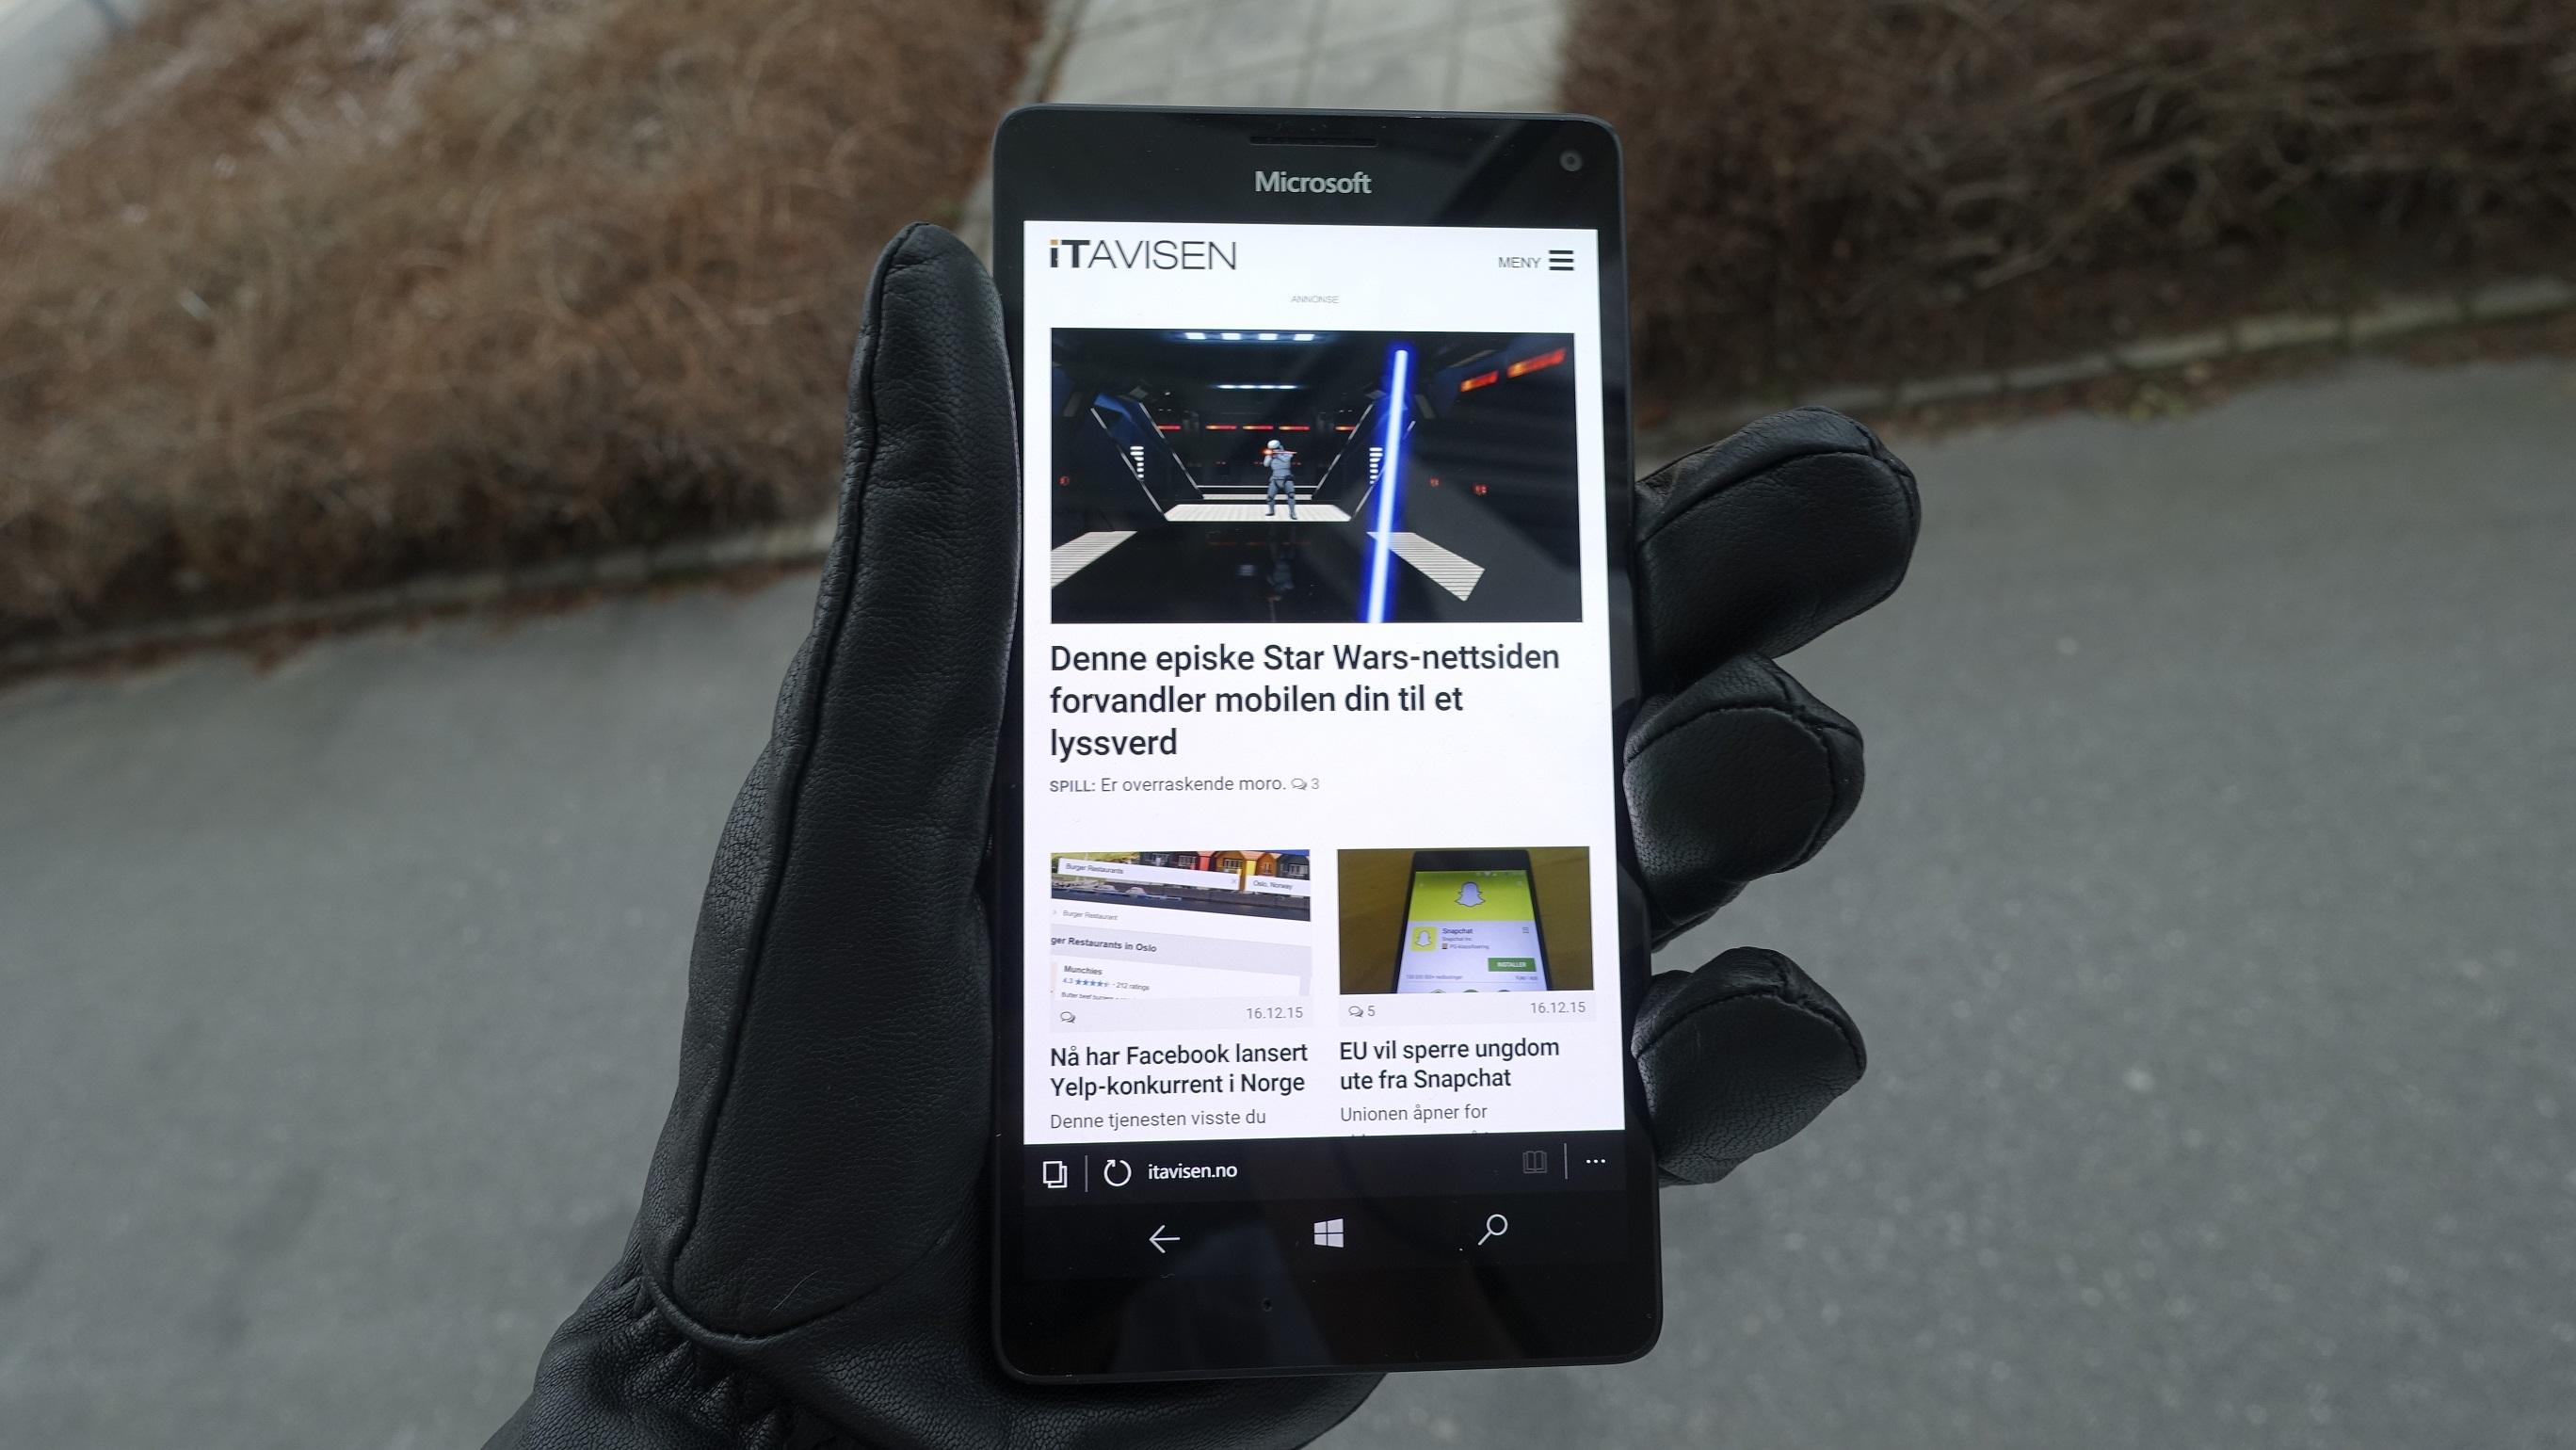 Nok en bunnotering for Microsoft Windows Phone.